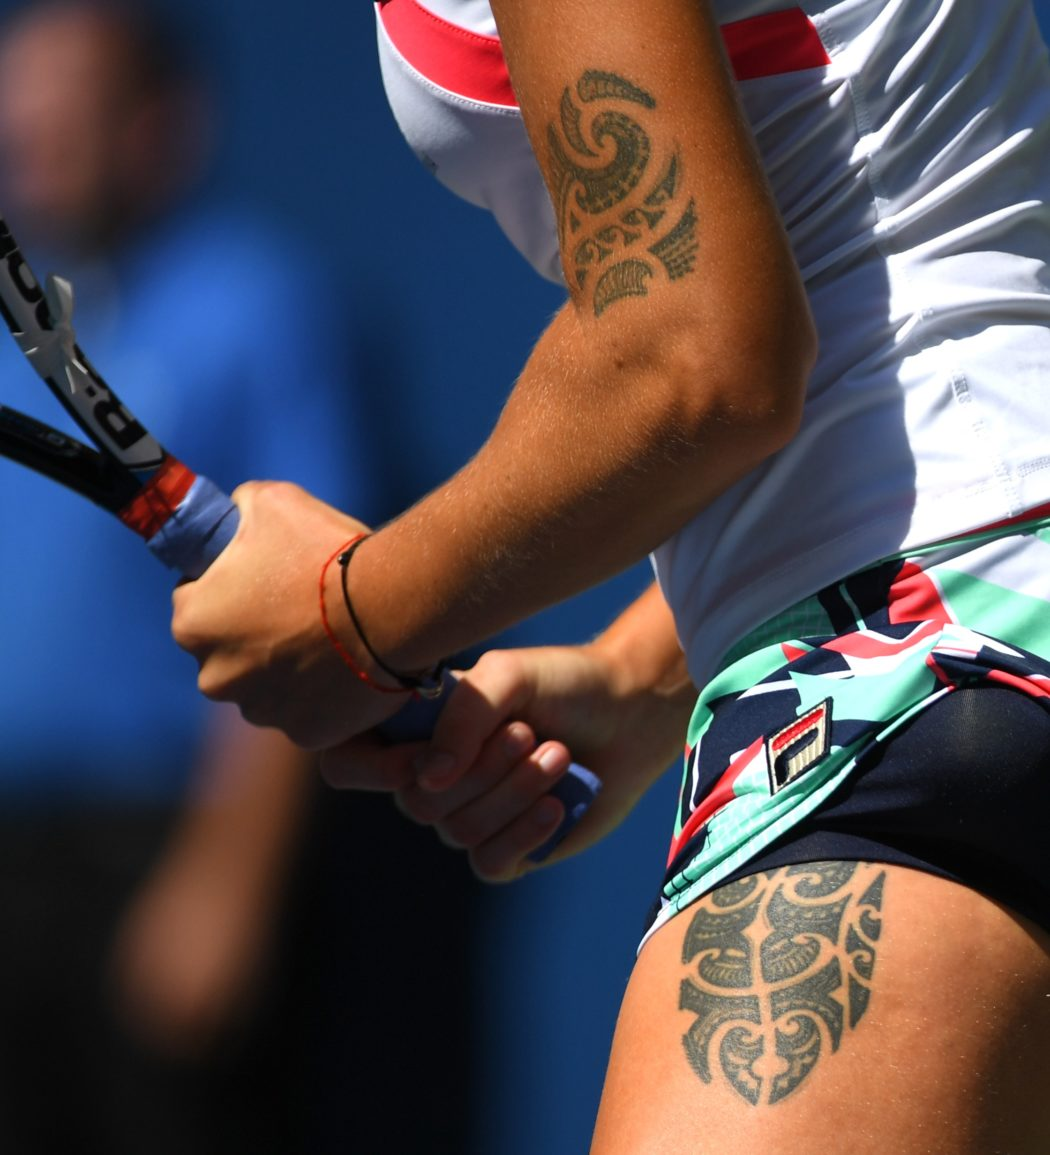 Tattoos In Tennis Stan Wawrinka Karolina Pliskova And Much